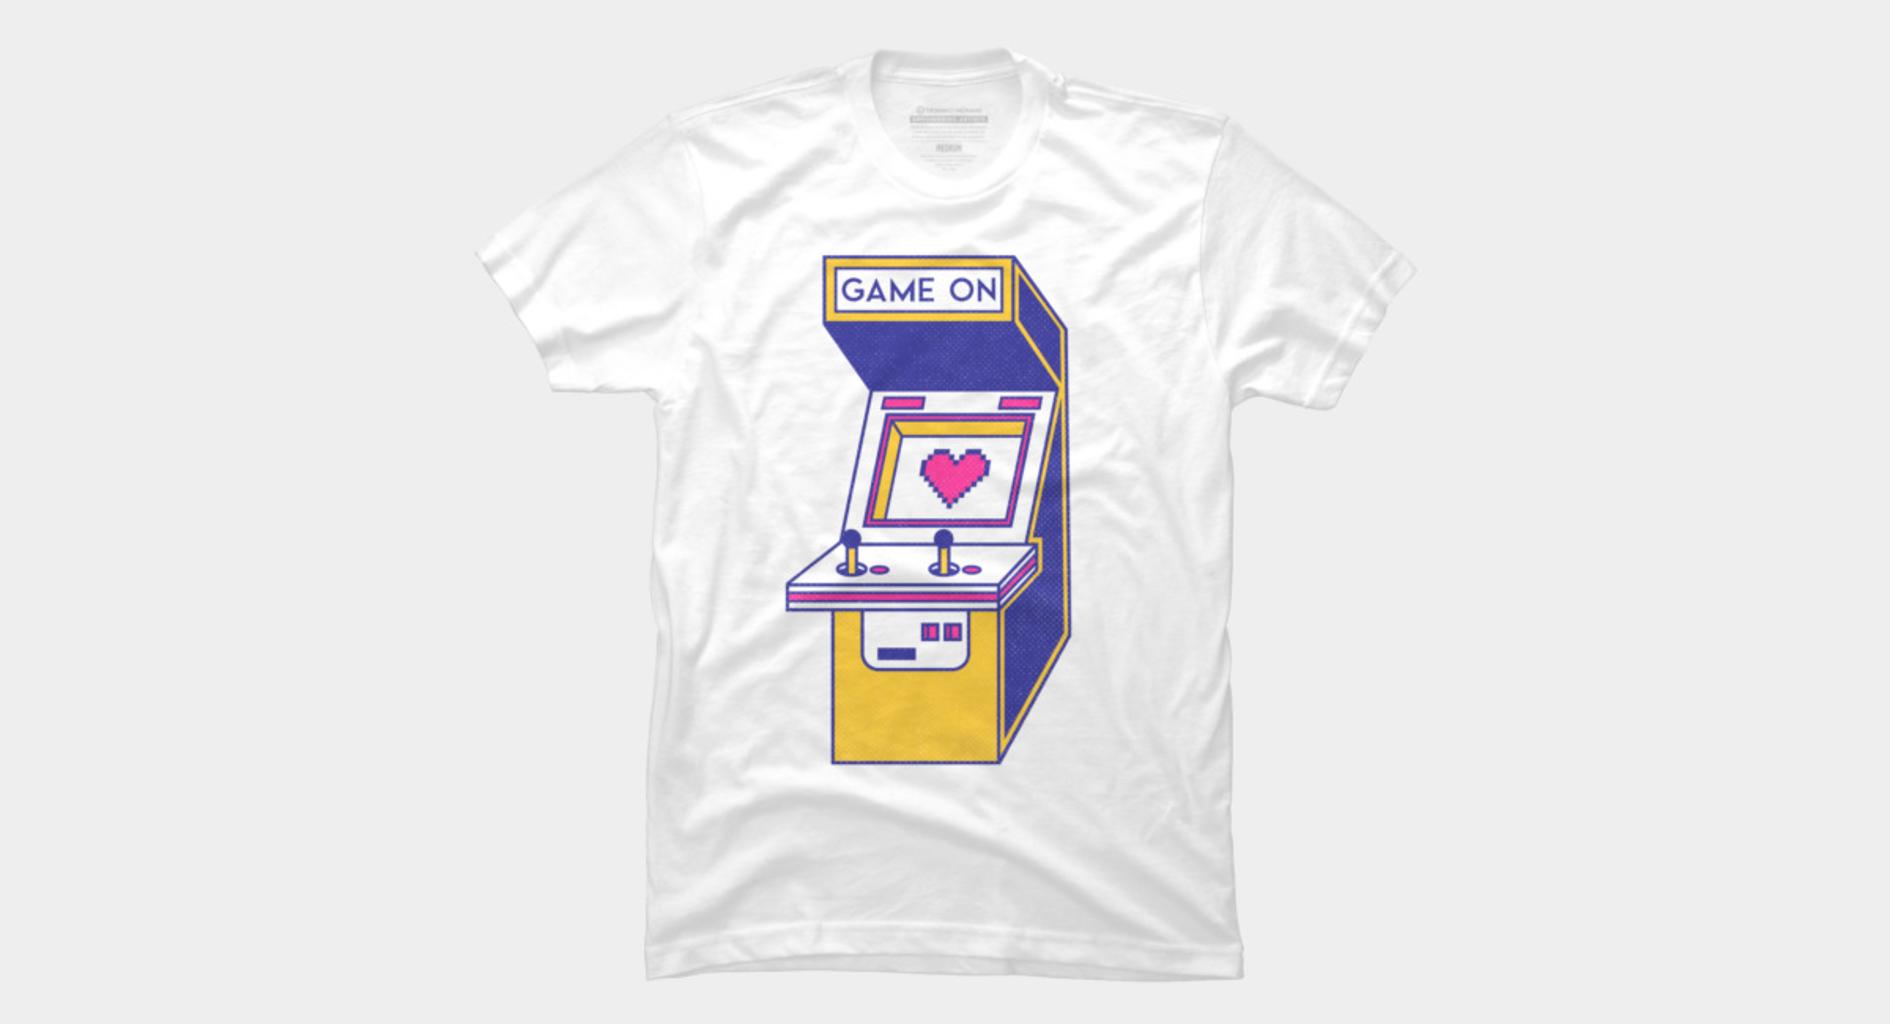 Design by Humans: Retro Arcade Video Game